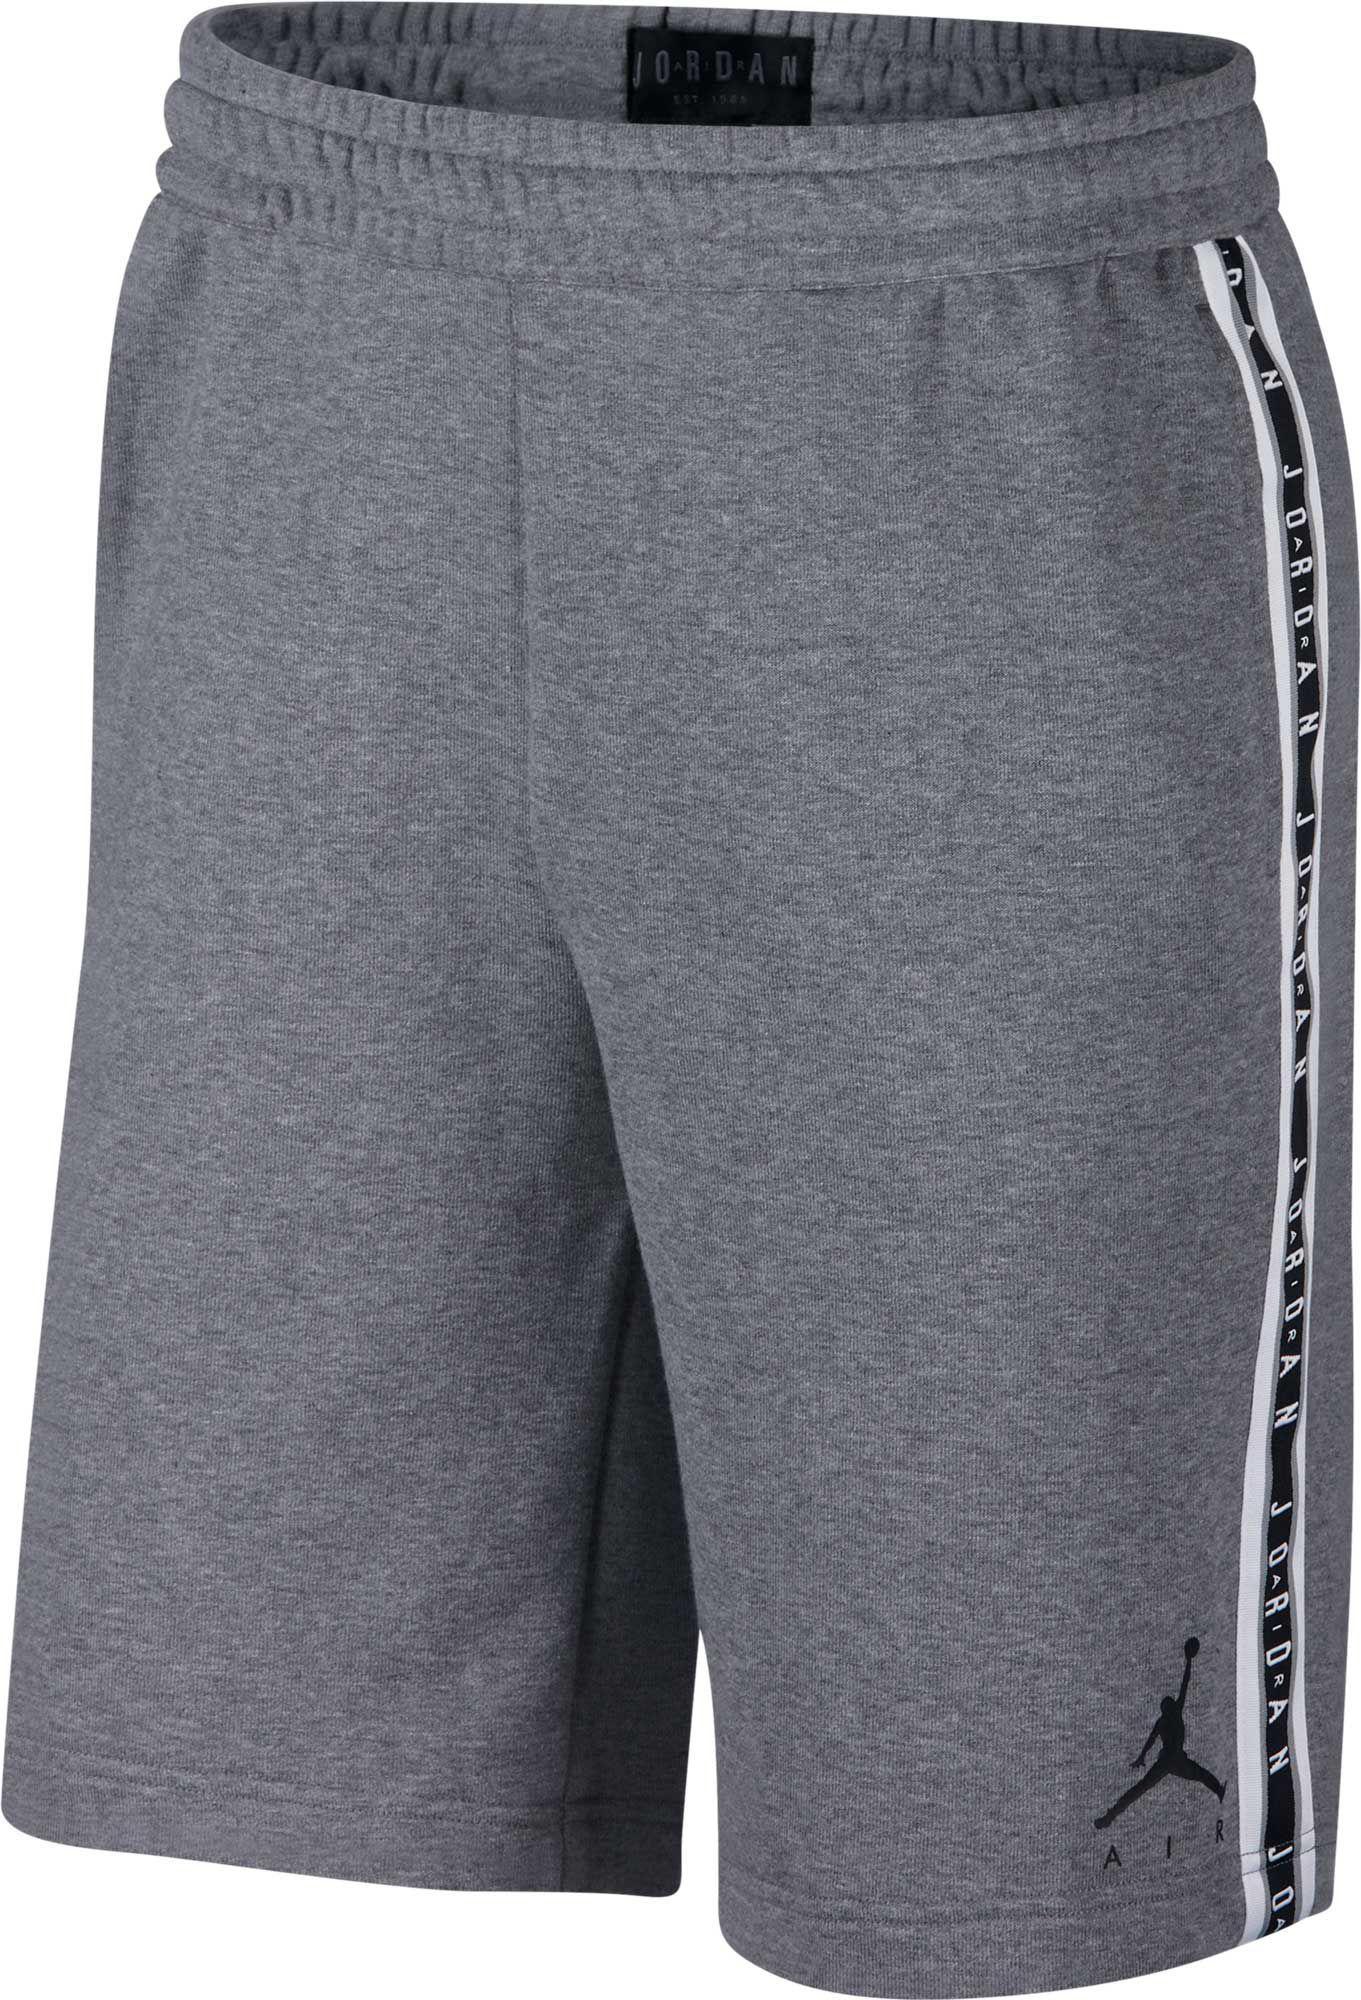 4f9d598e0d6b67 Lyst - Nike Air Hbr Fleece Shorts in Gray for Men